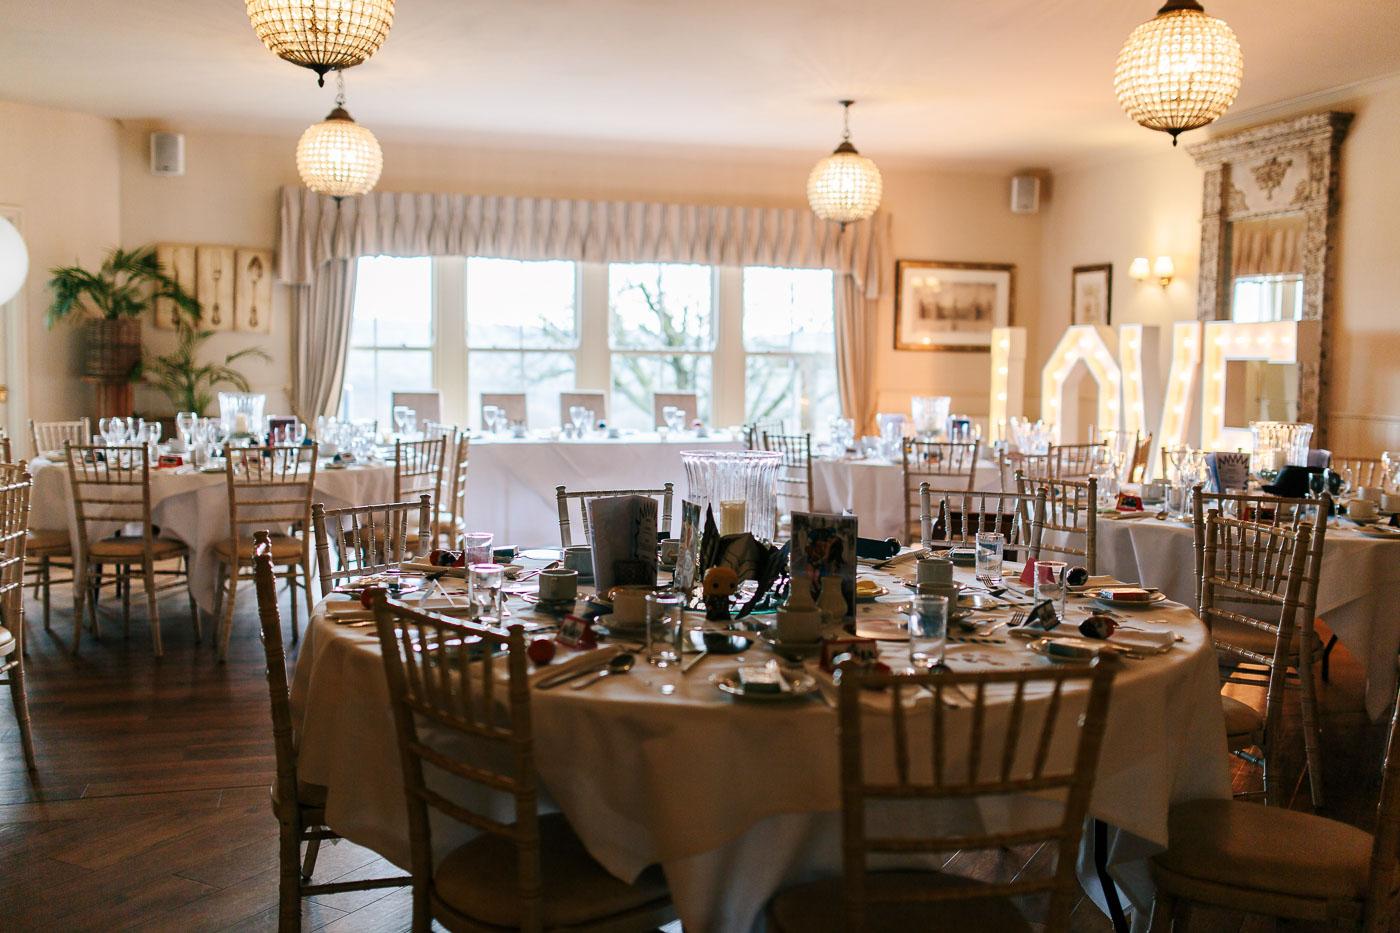 The Shireburn Arms Hotel Wedding Venue